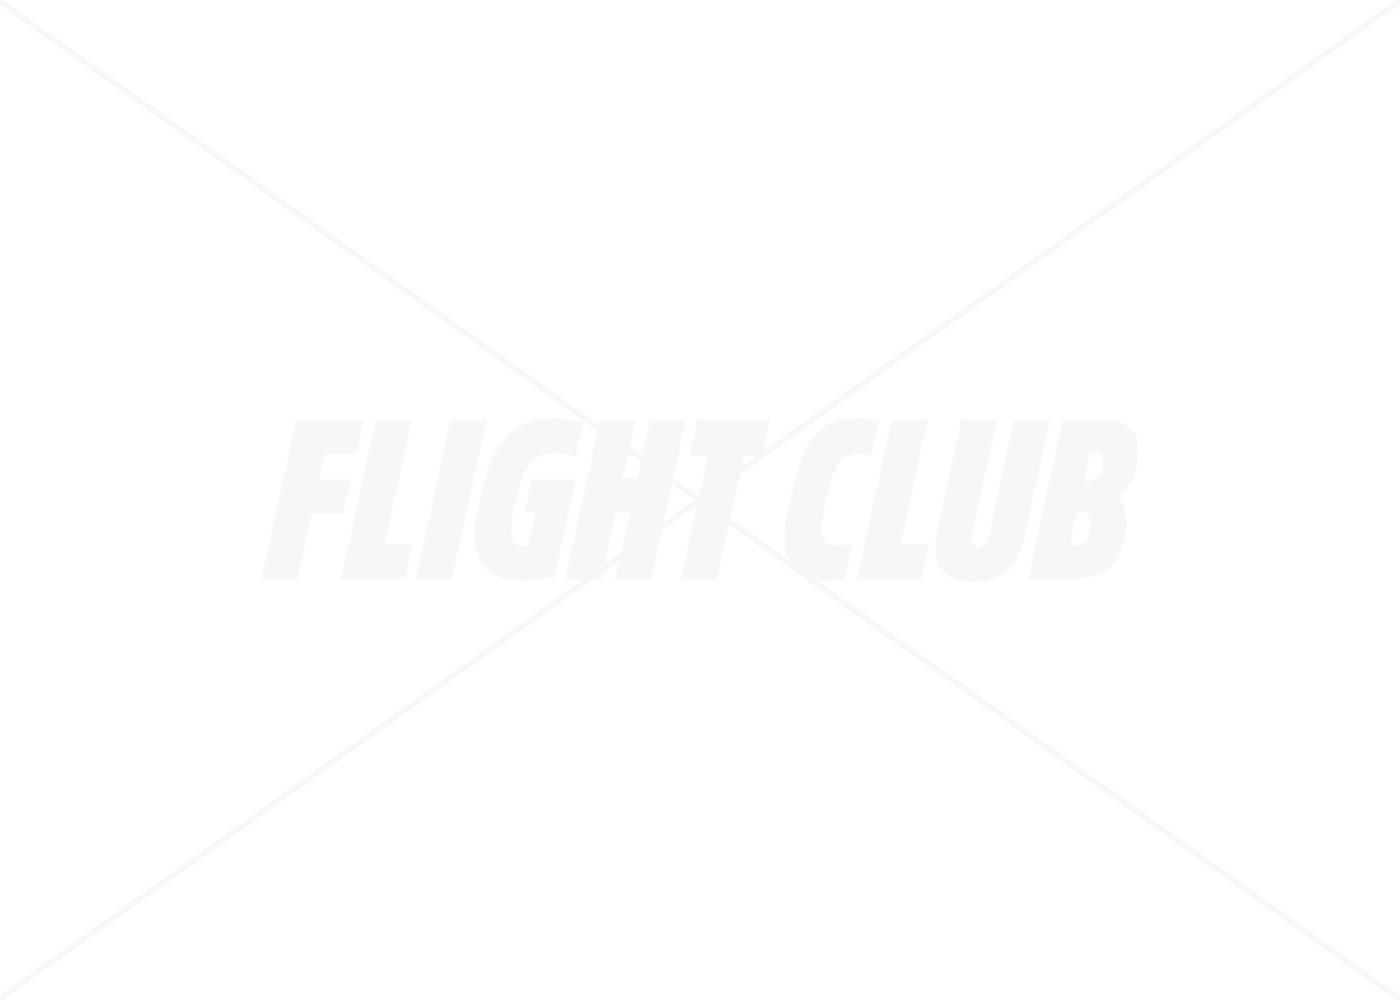 Air Jordan 1 Retro High Air Jordan 344613 061 black max orange white Flight Club